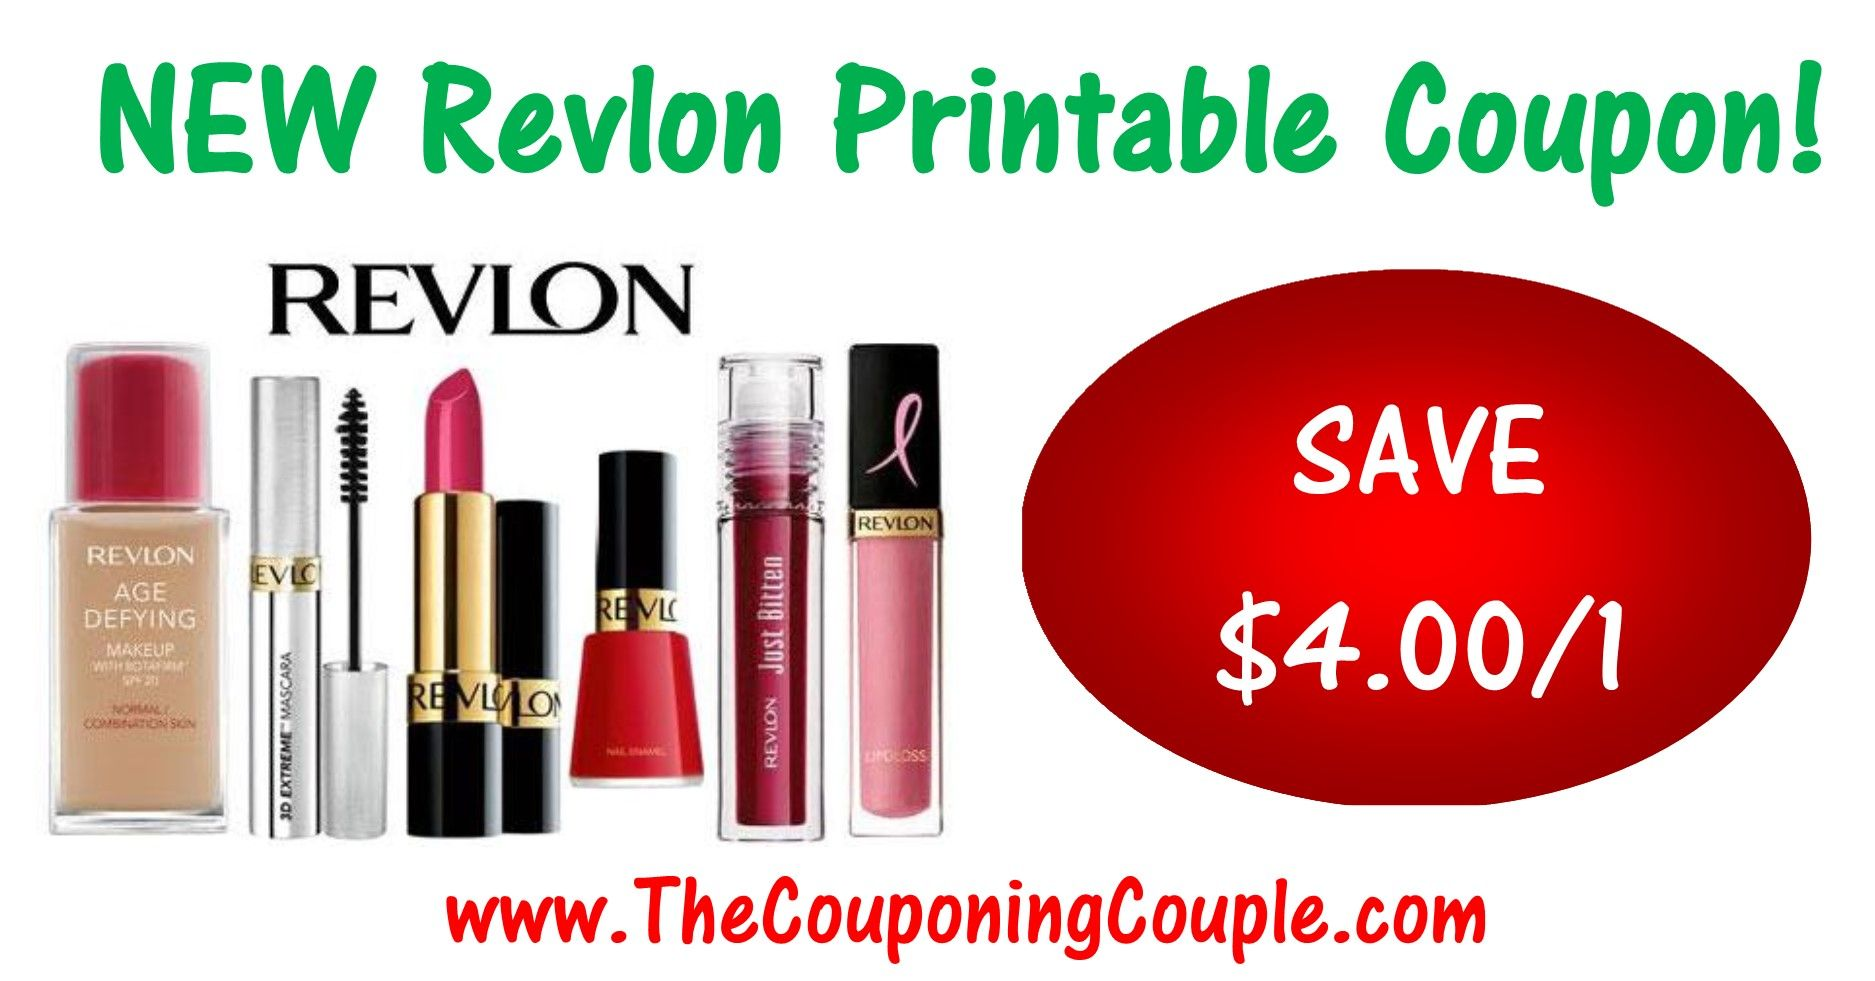 High Value Revlon Printable Coupon 4 00 1 Print Now Print Coupons Printable Coupons Revlon